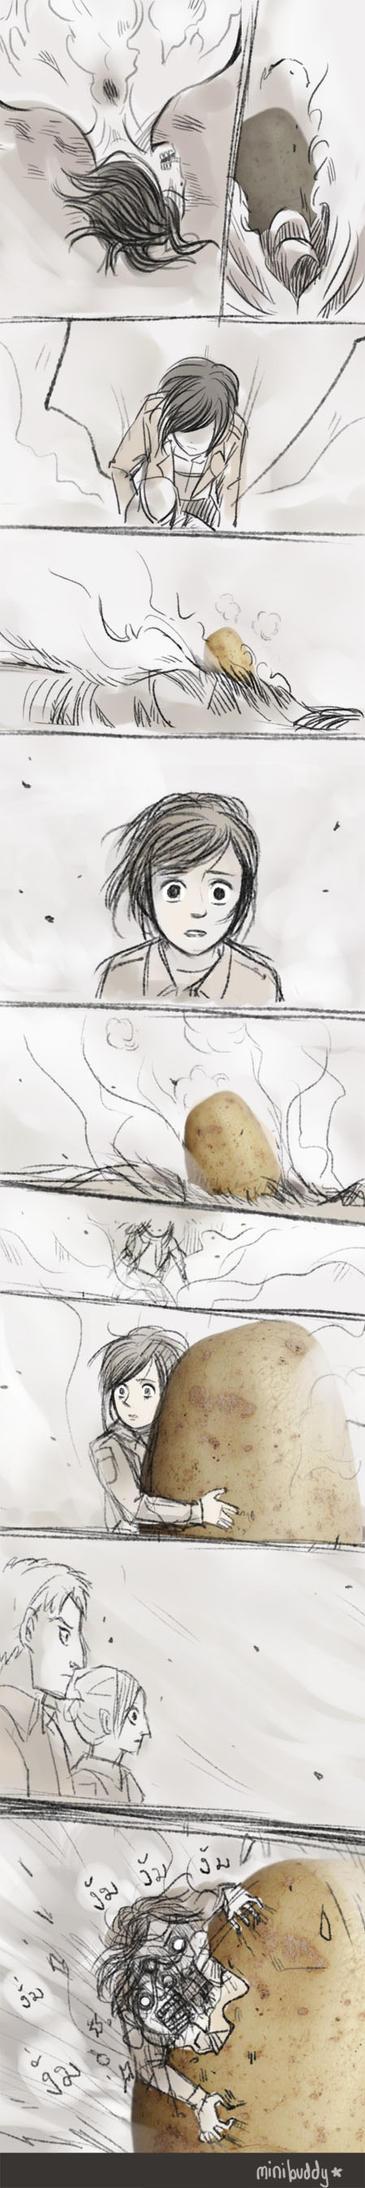 The most Epic Scene- Attack on Titan by minibuddy